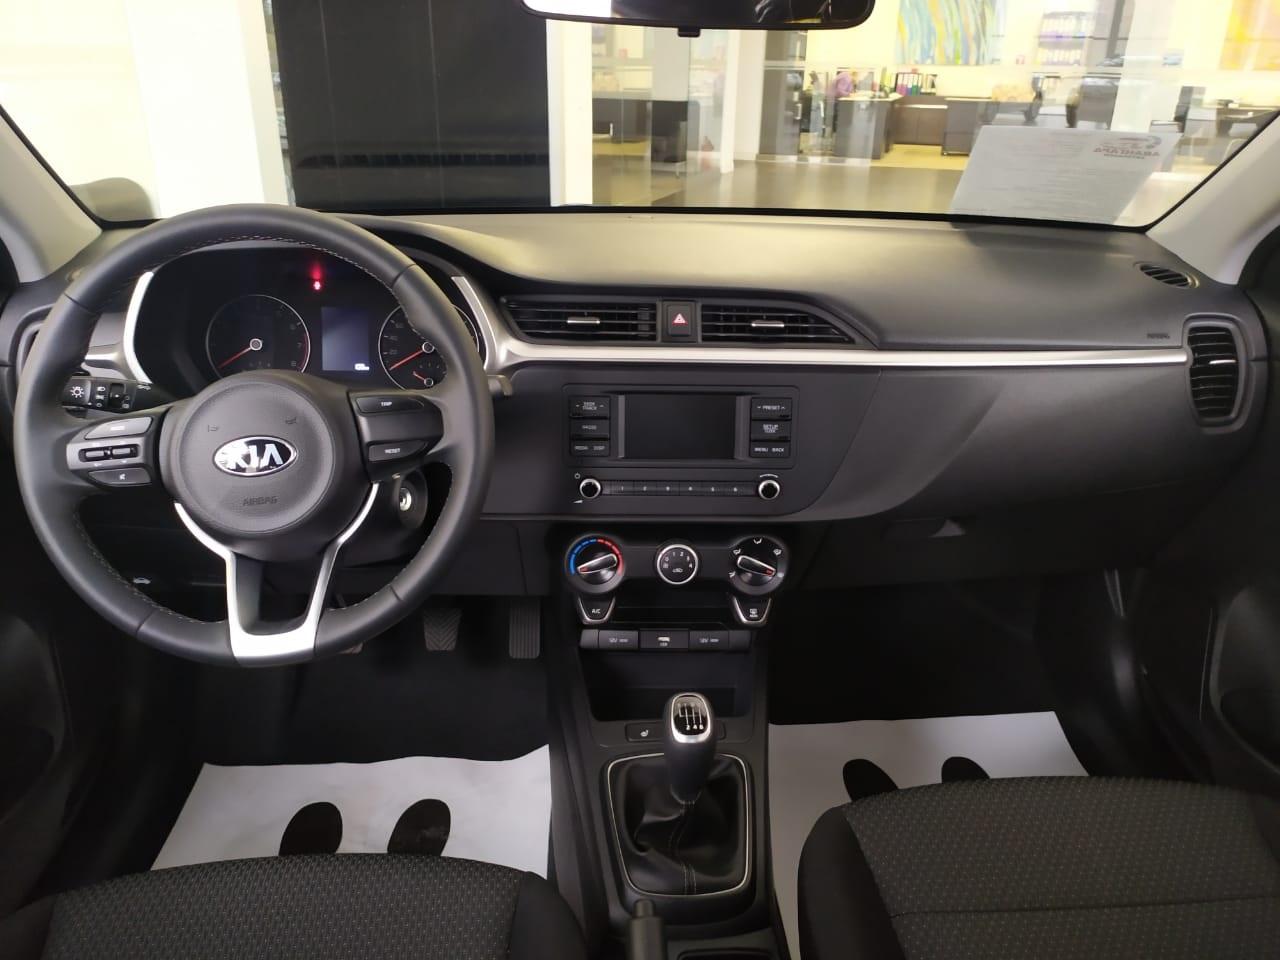 Kia Rio New Седан 1.6 л., 16-кл., (123 л.с.) 6МТ. Comfort 2020